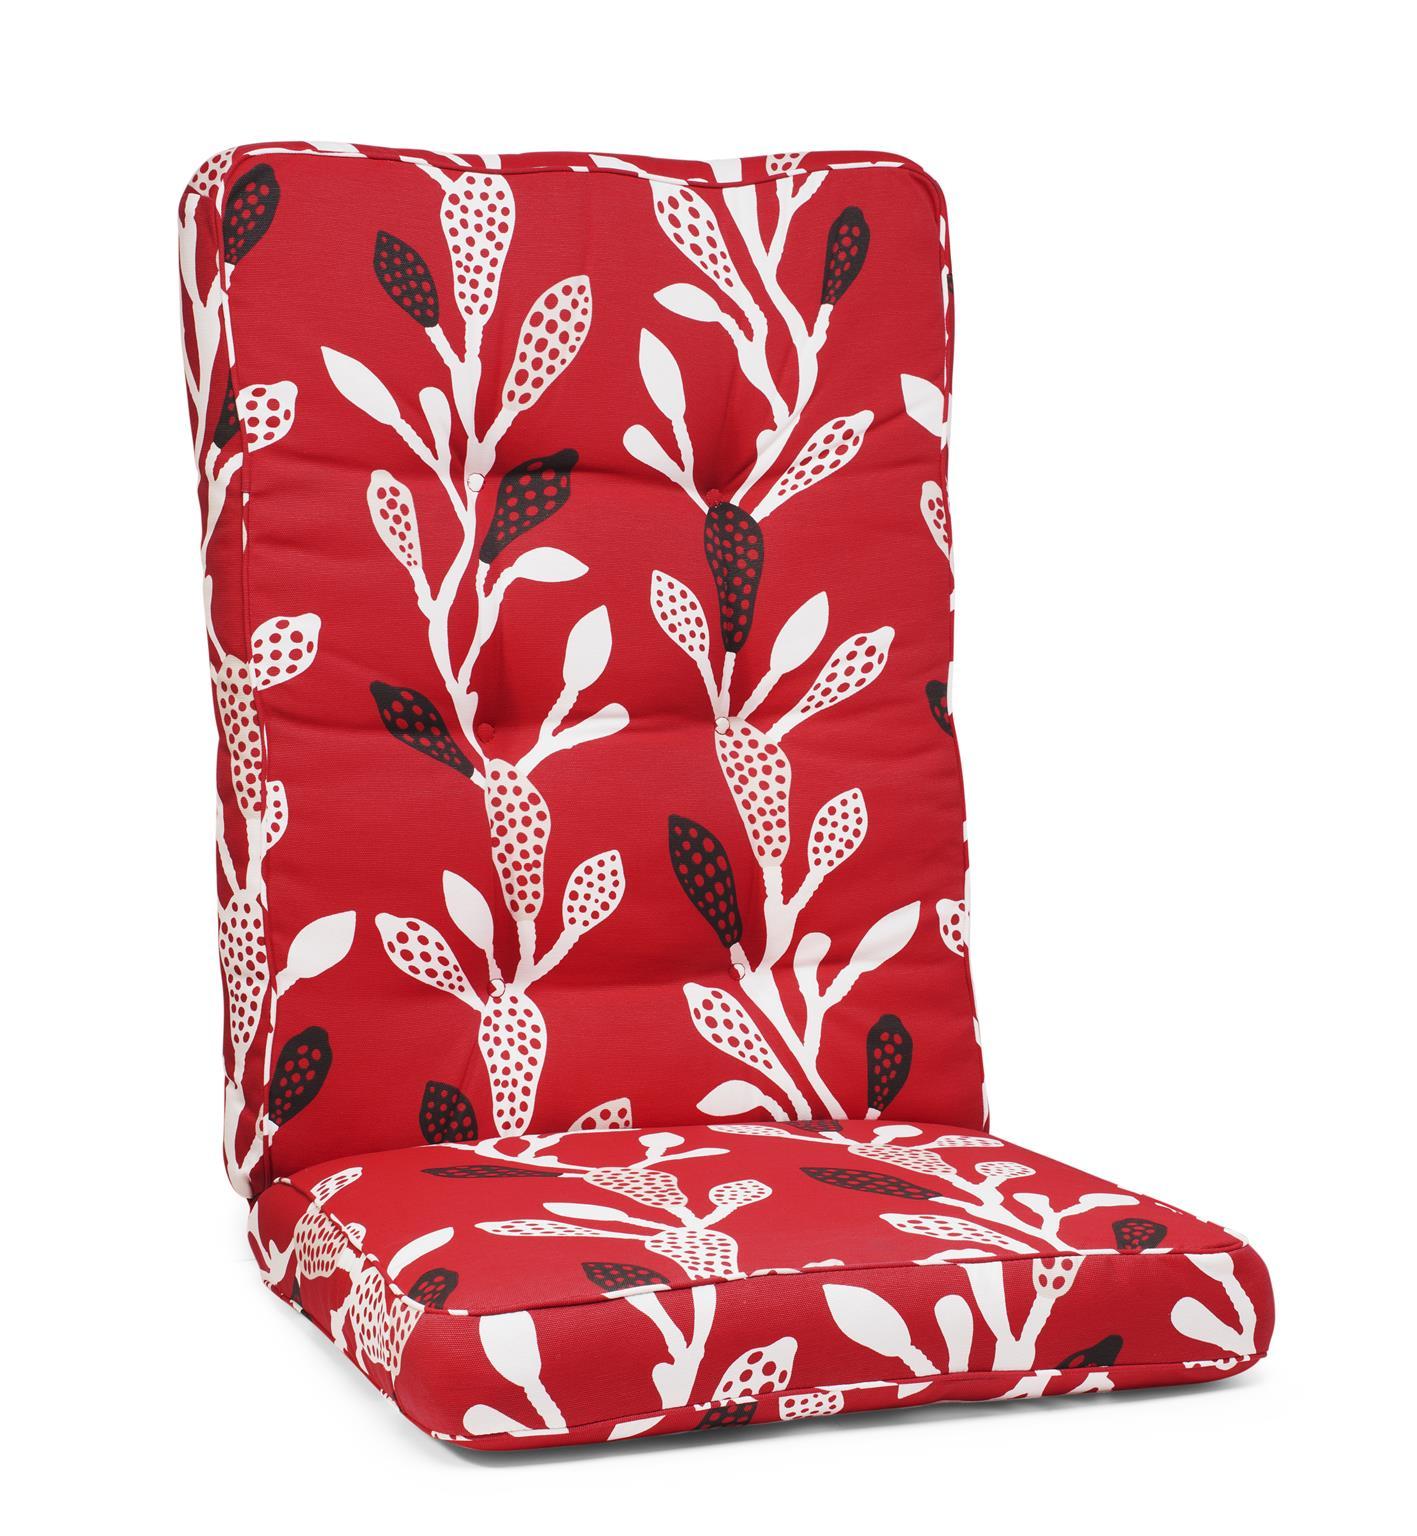 Hillerstorp Texas Dyna Hög 56x127x11 cm röd mönster bomull/polyester.